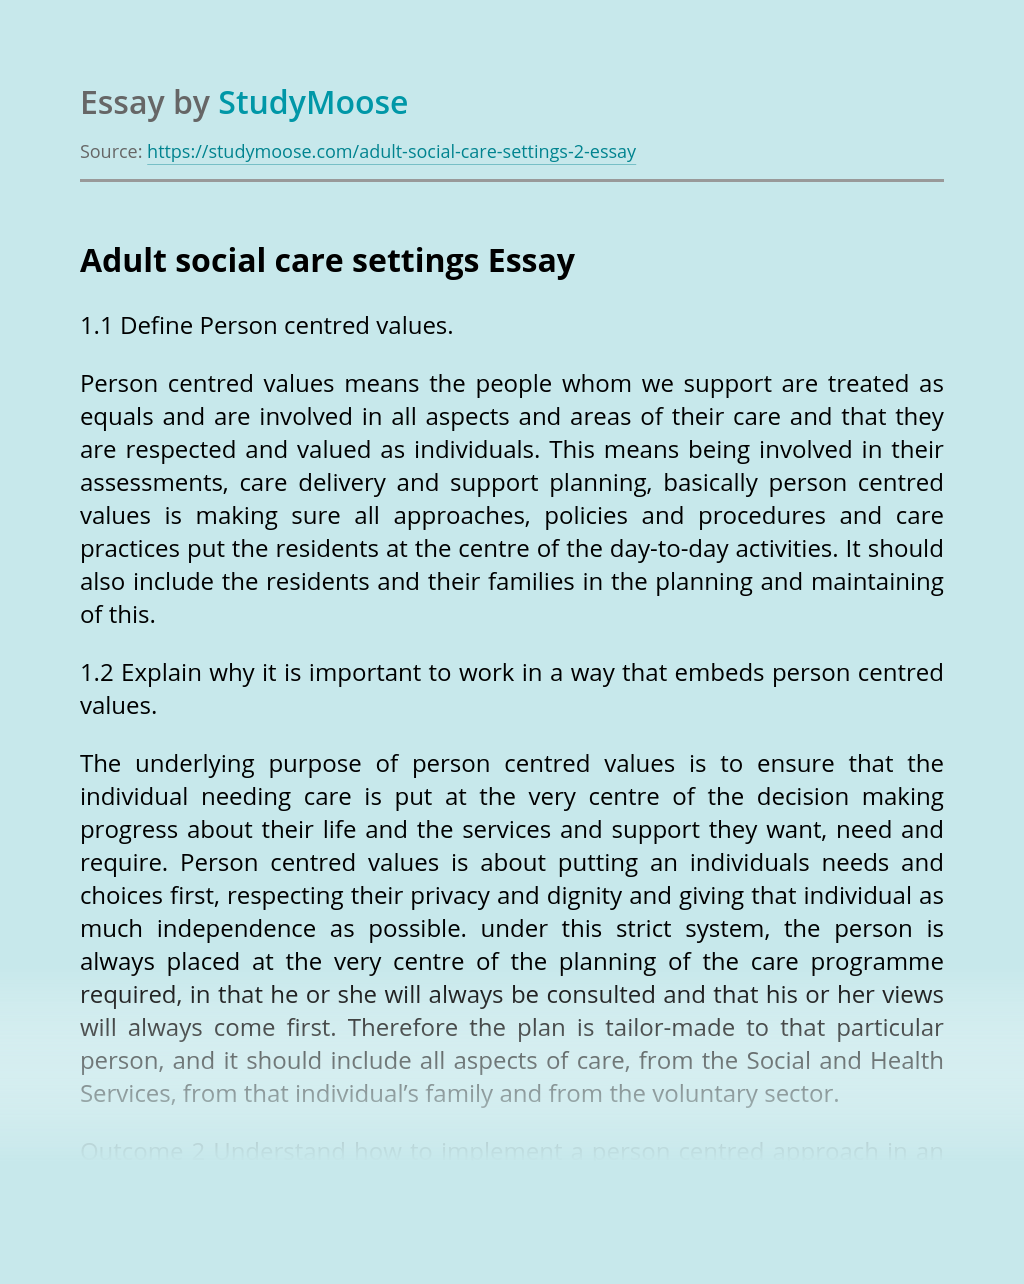 Adult social care settings